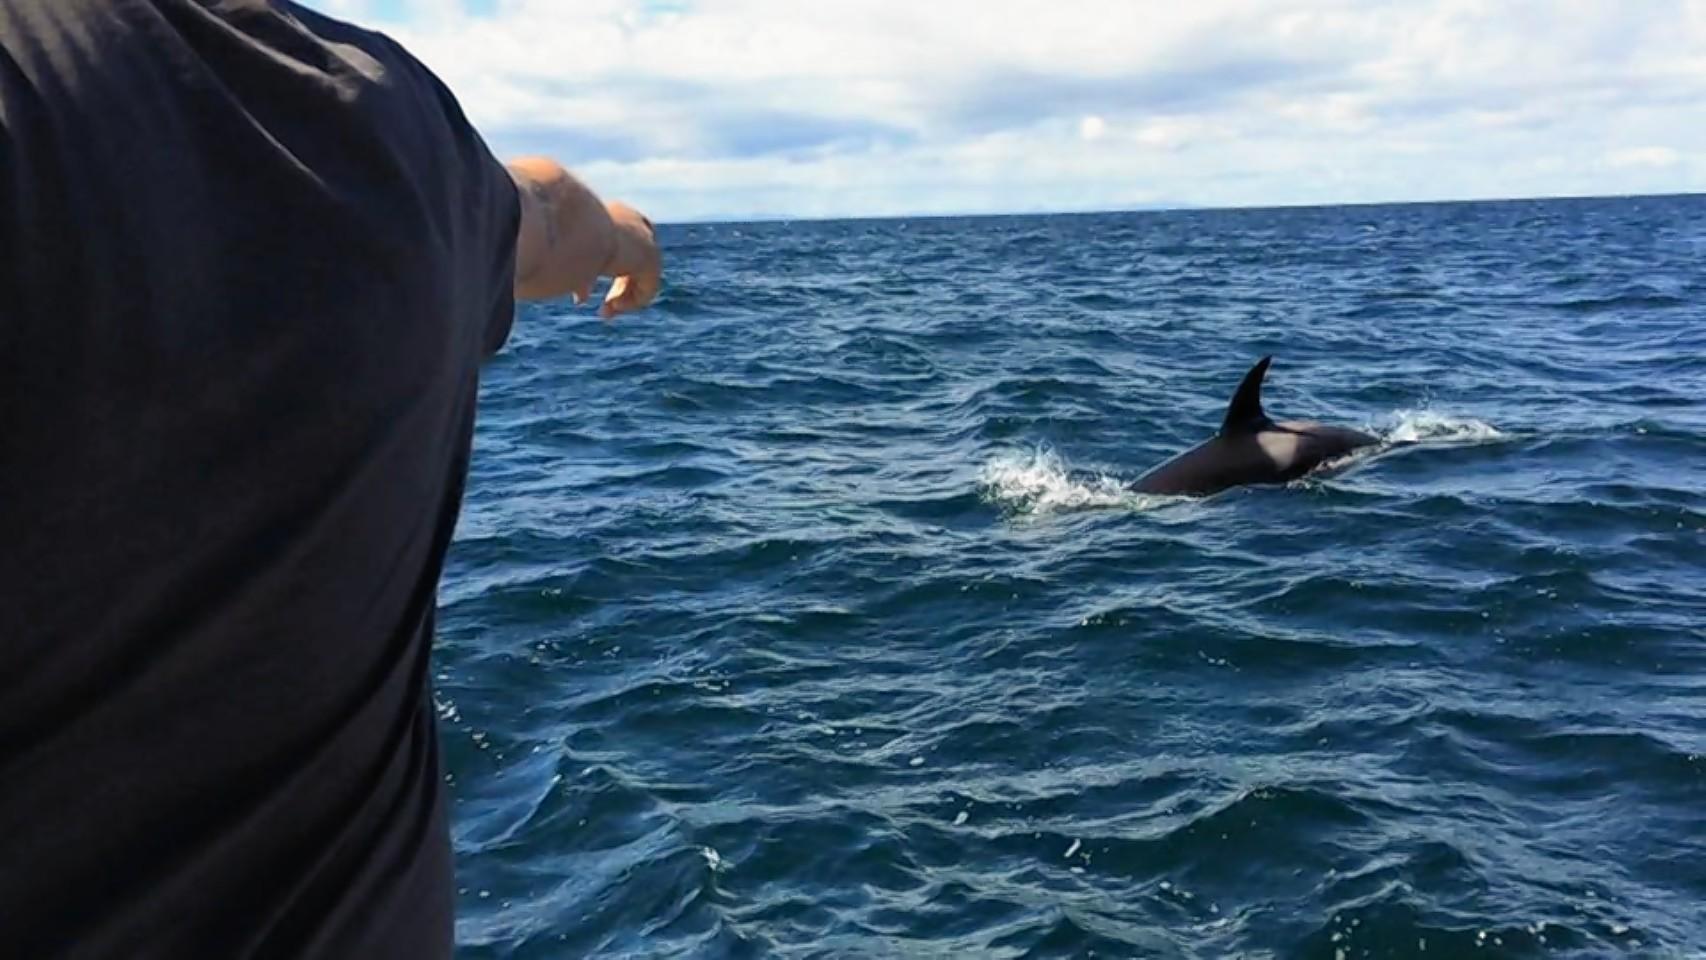 The Buckie family feed the killer whales off the Moray coast